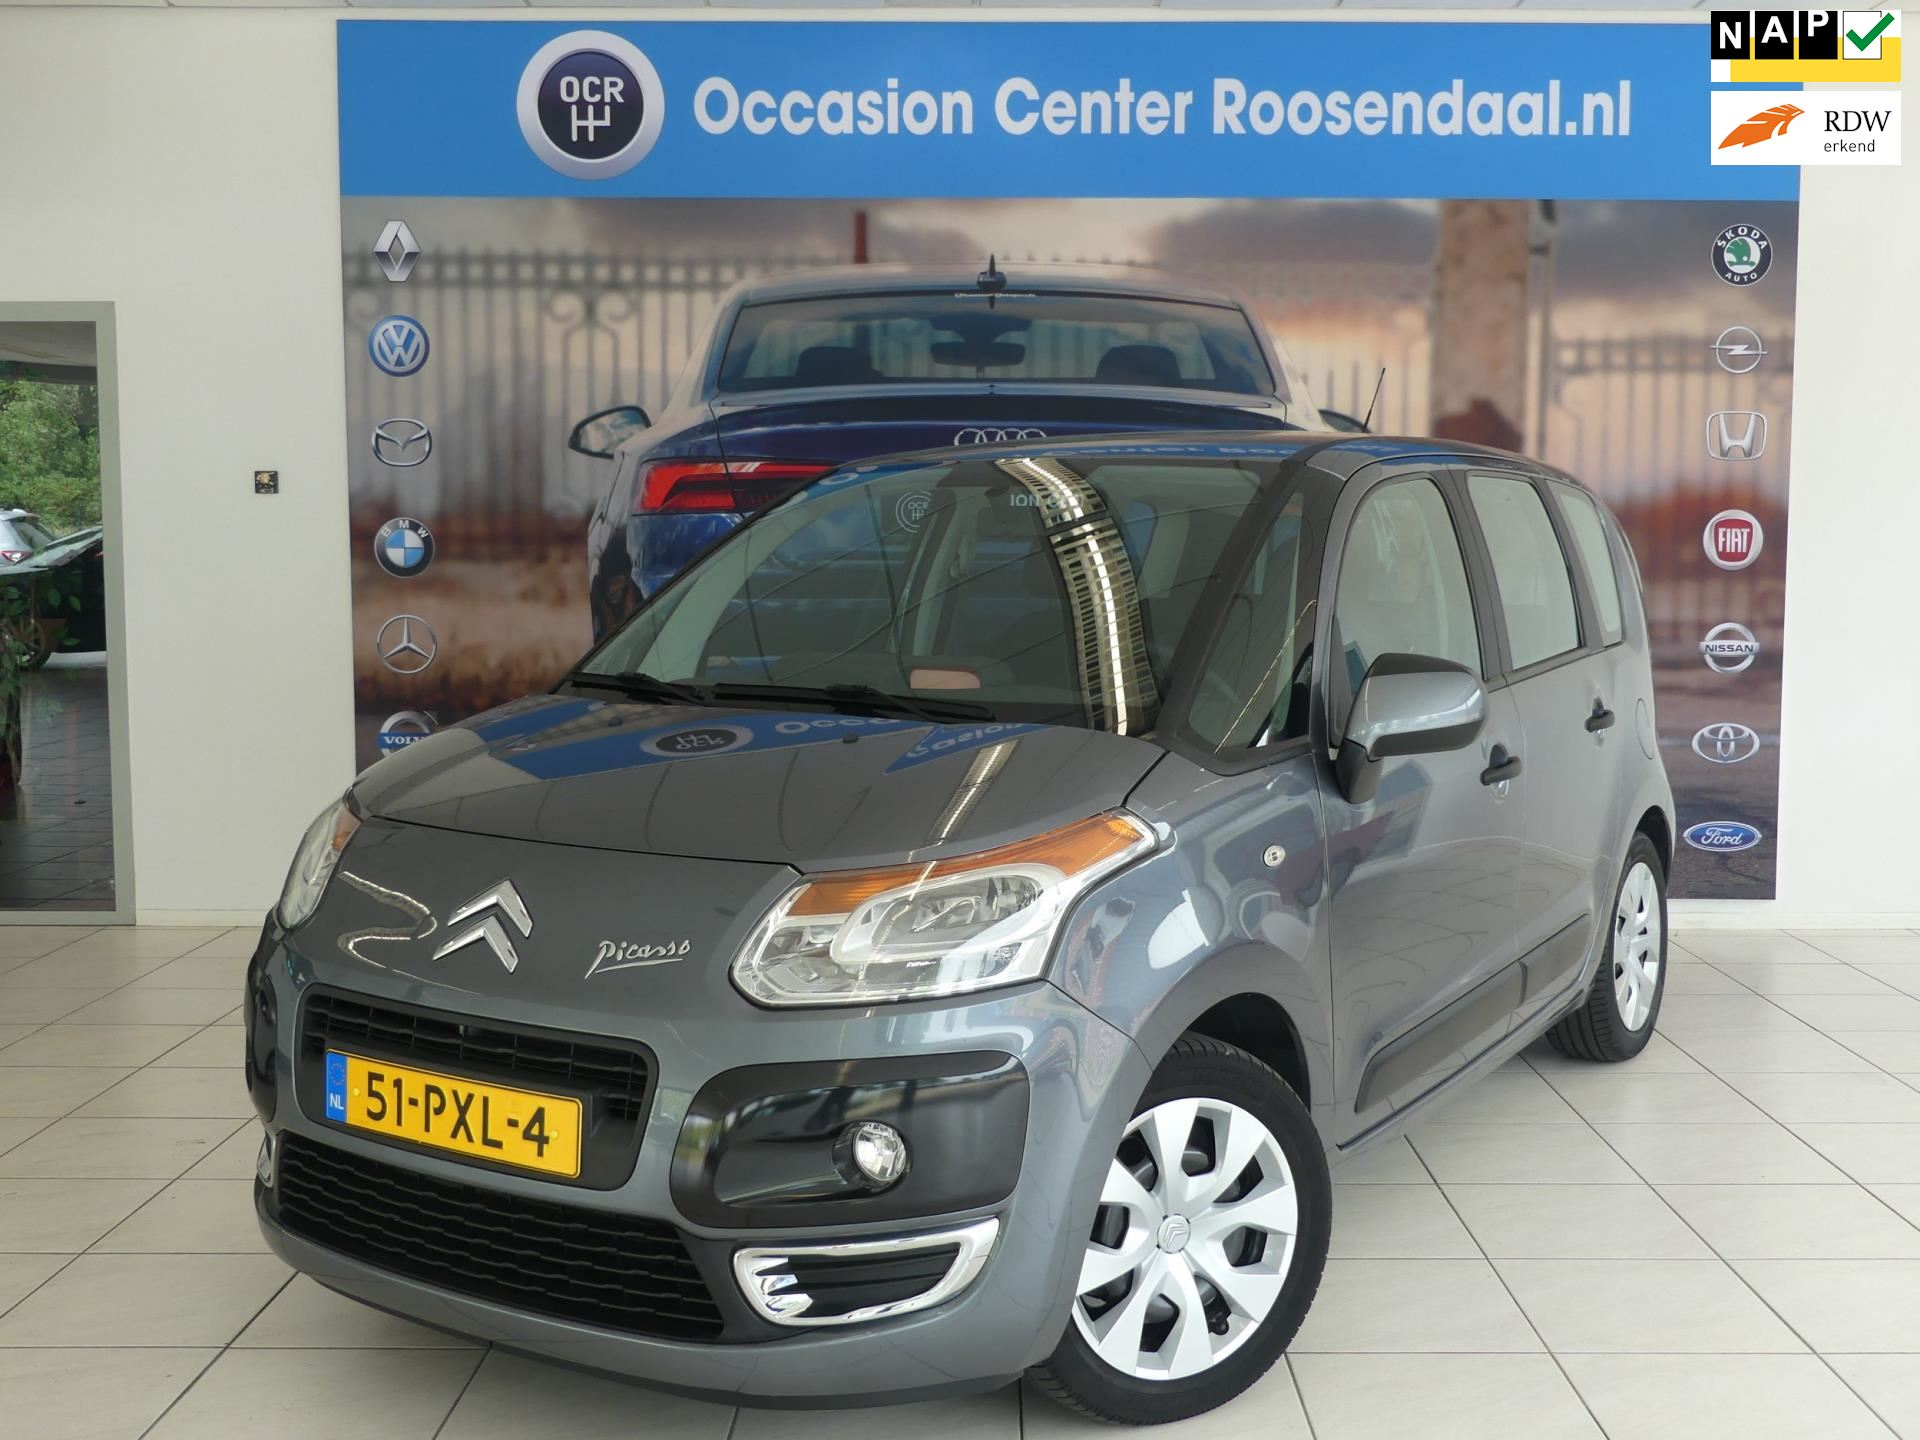 Citroen C3 Picasso occasion - Occasion Center Roosendaal